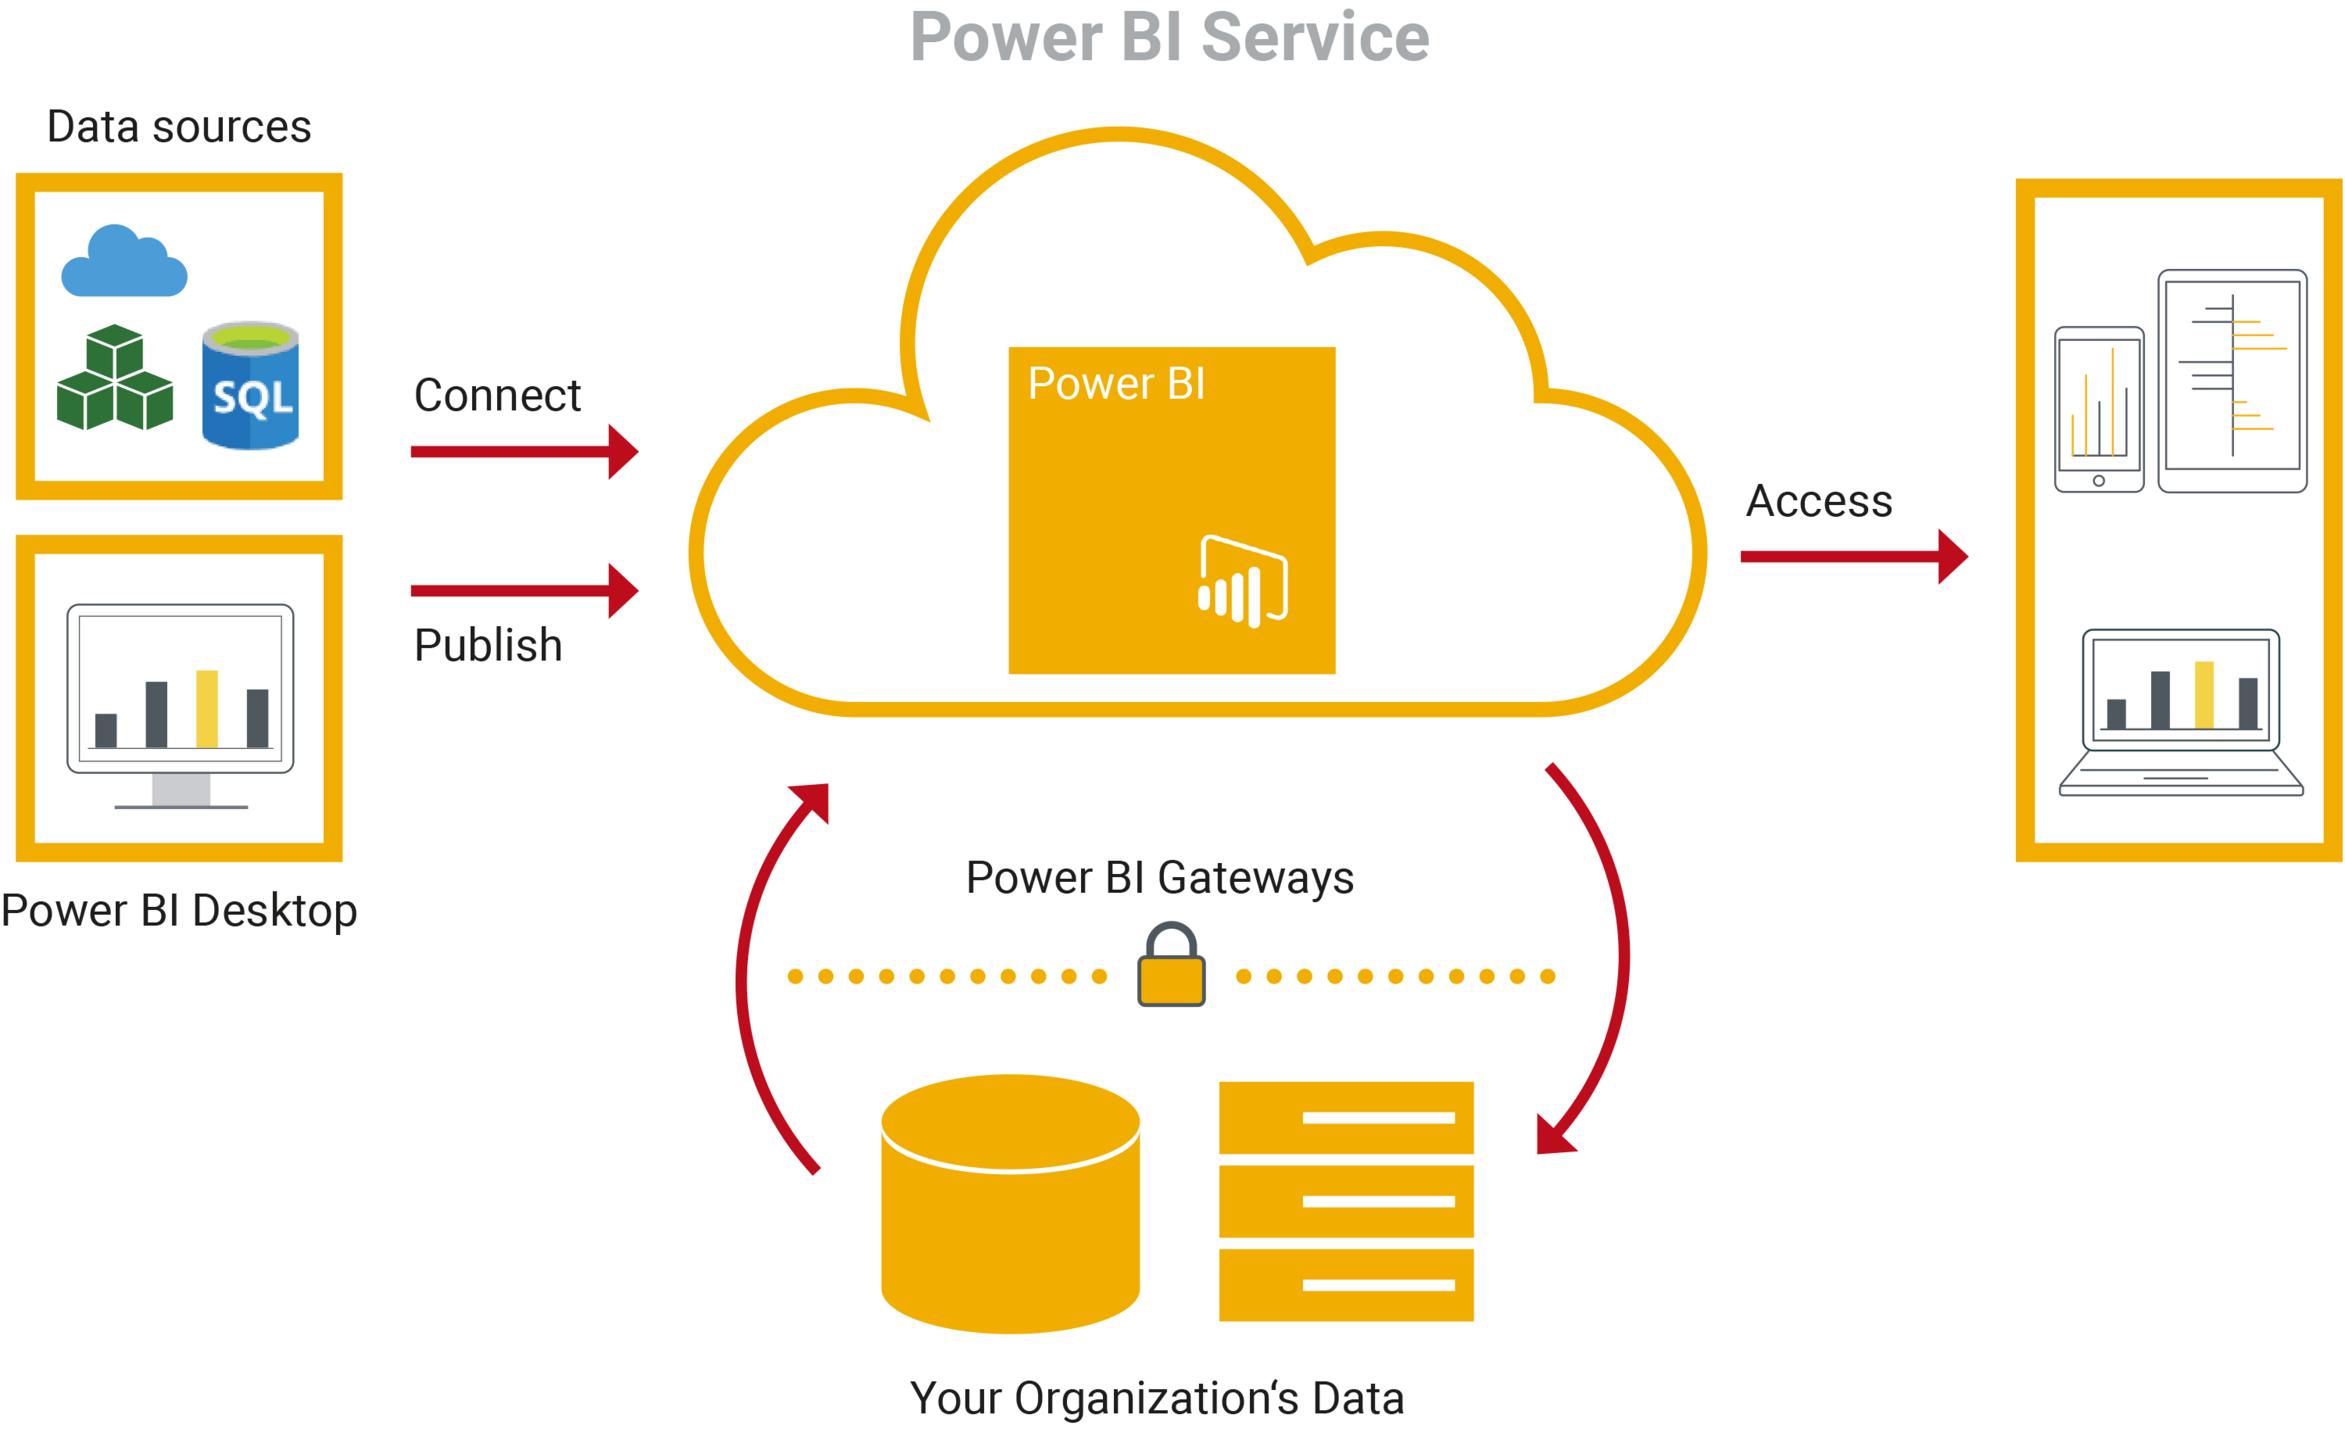 Arquitectura de servicios de Power BI